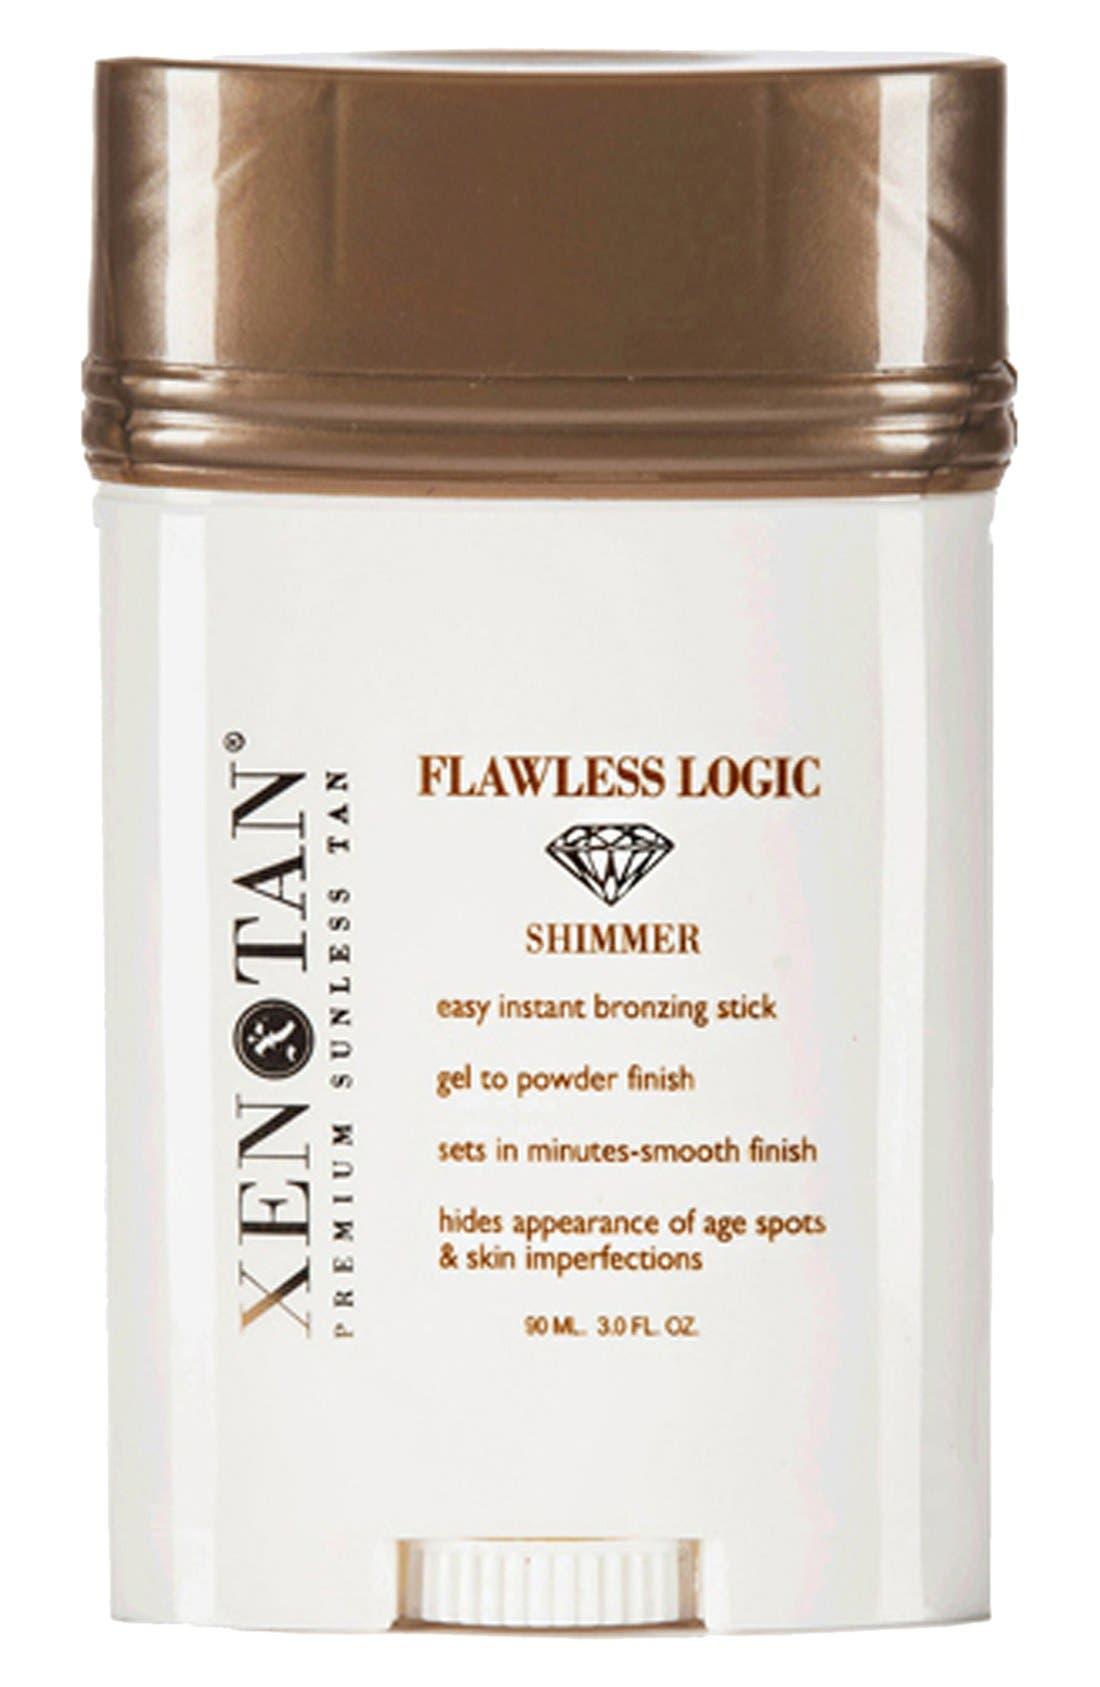 Xen-Tan® 'Flawless Logic' Bronzing Stick